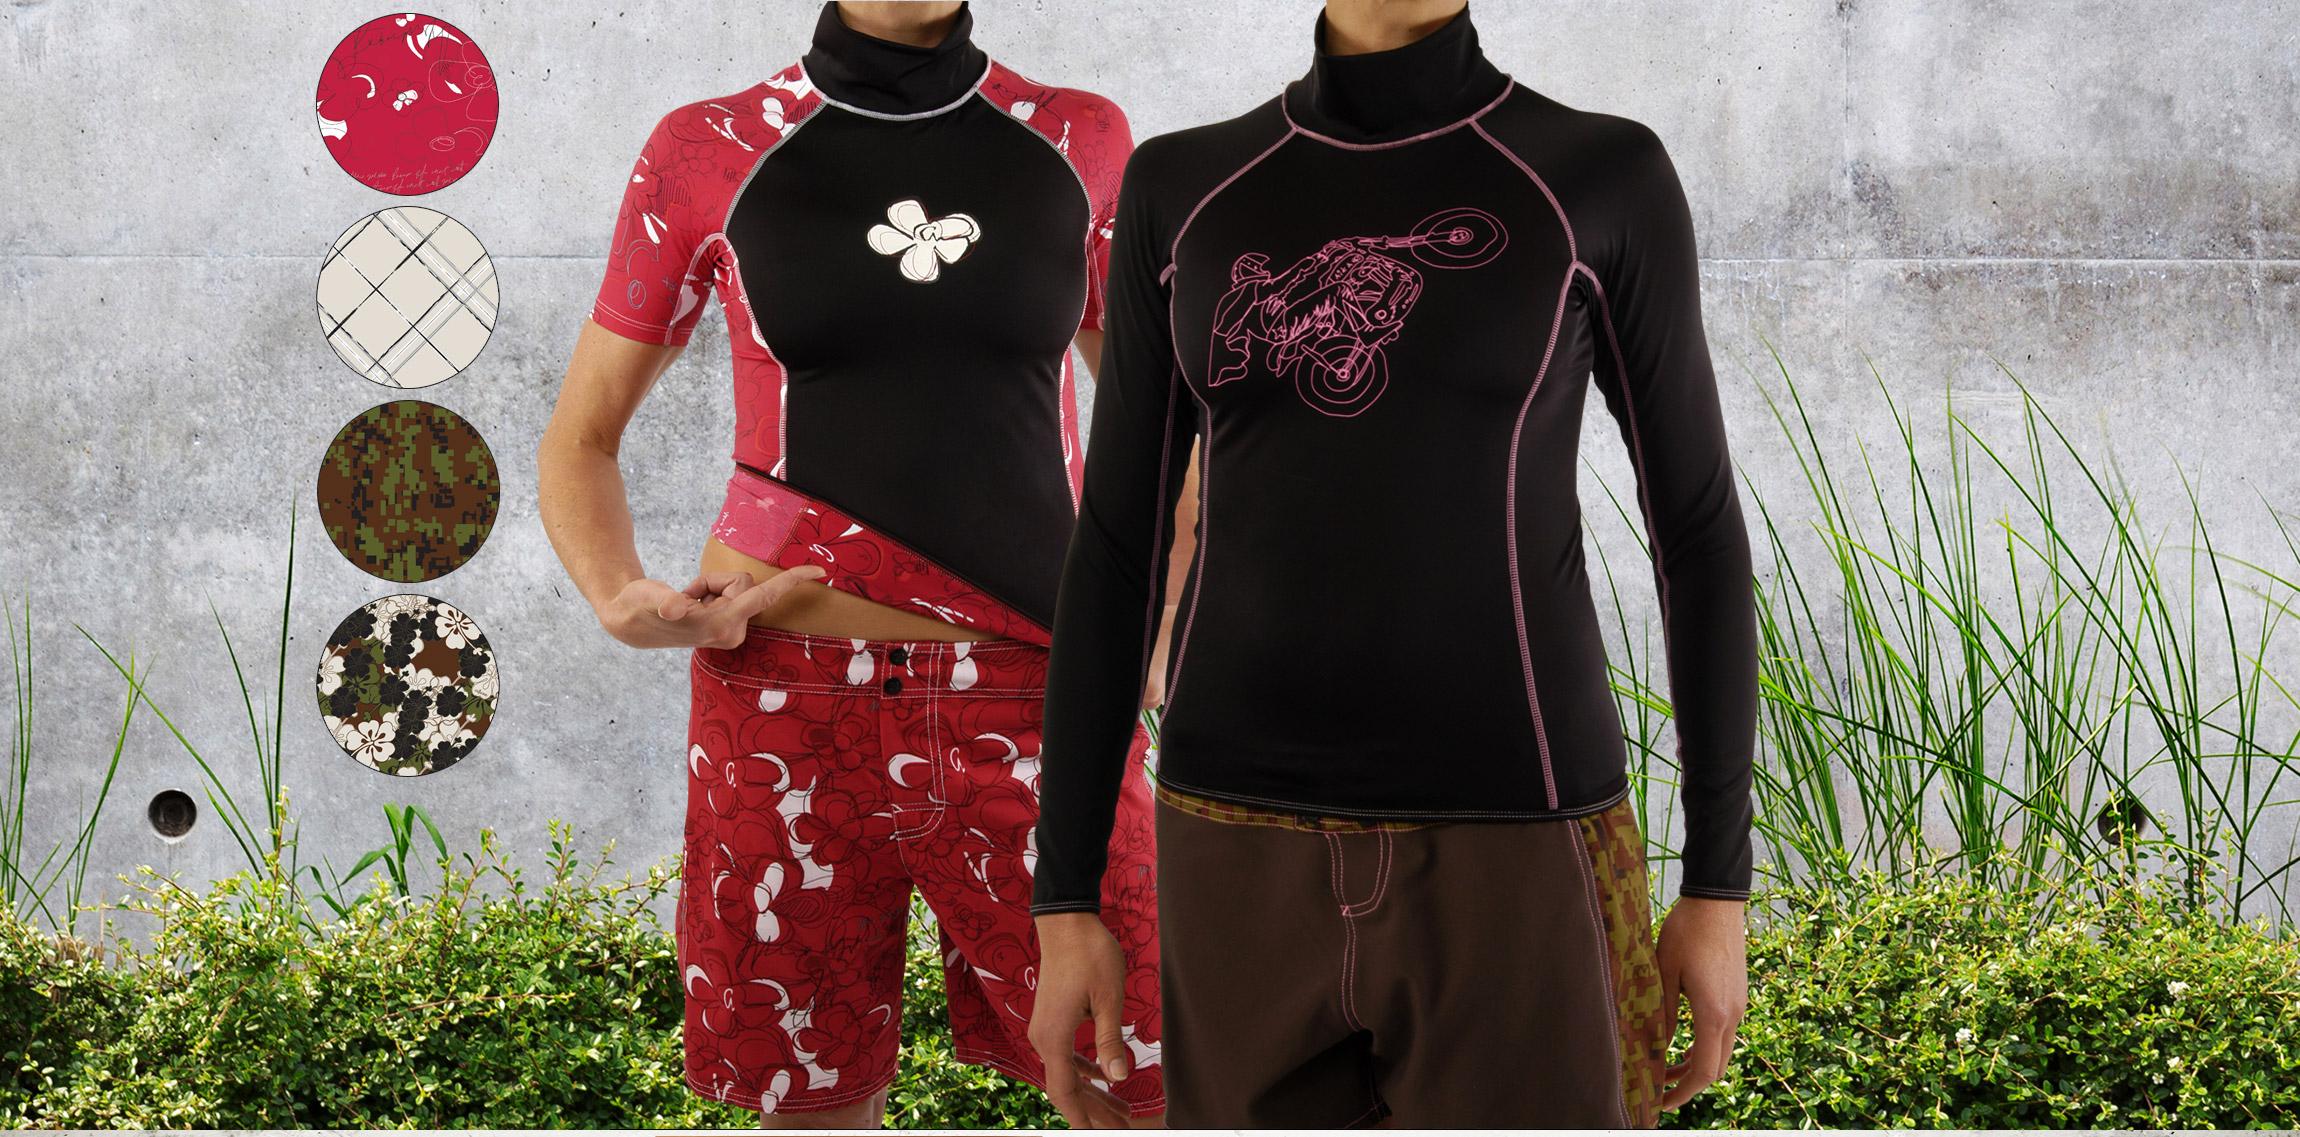 Aikane Surf - womens apparel - rashguards shorts - Graphic Regime